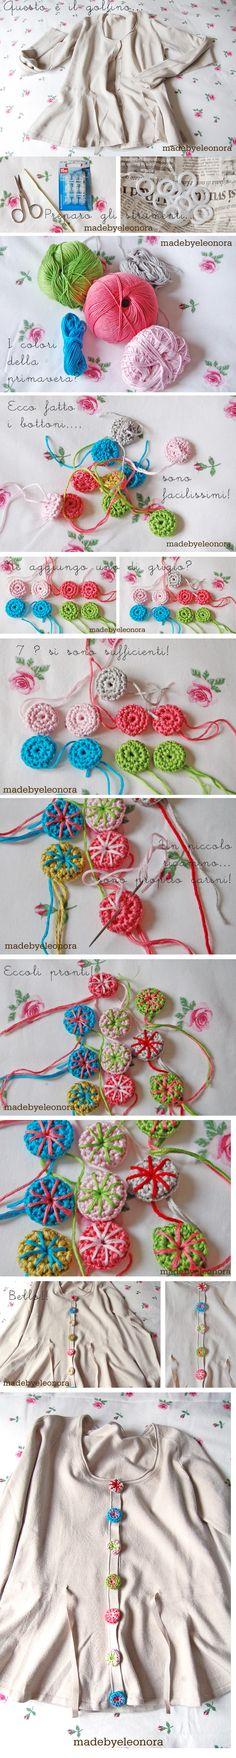 Crochet Bottons - Photo Tutorial ❥ 4U // hf